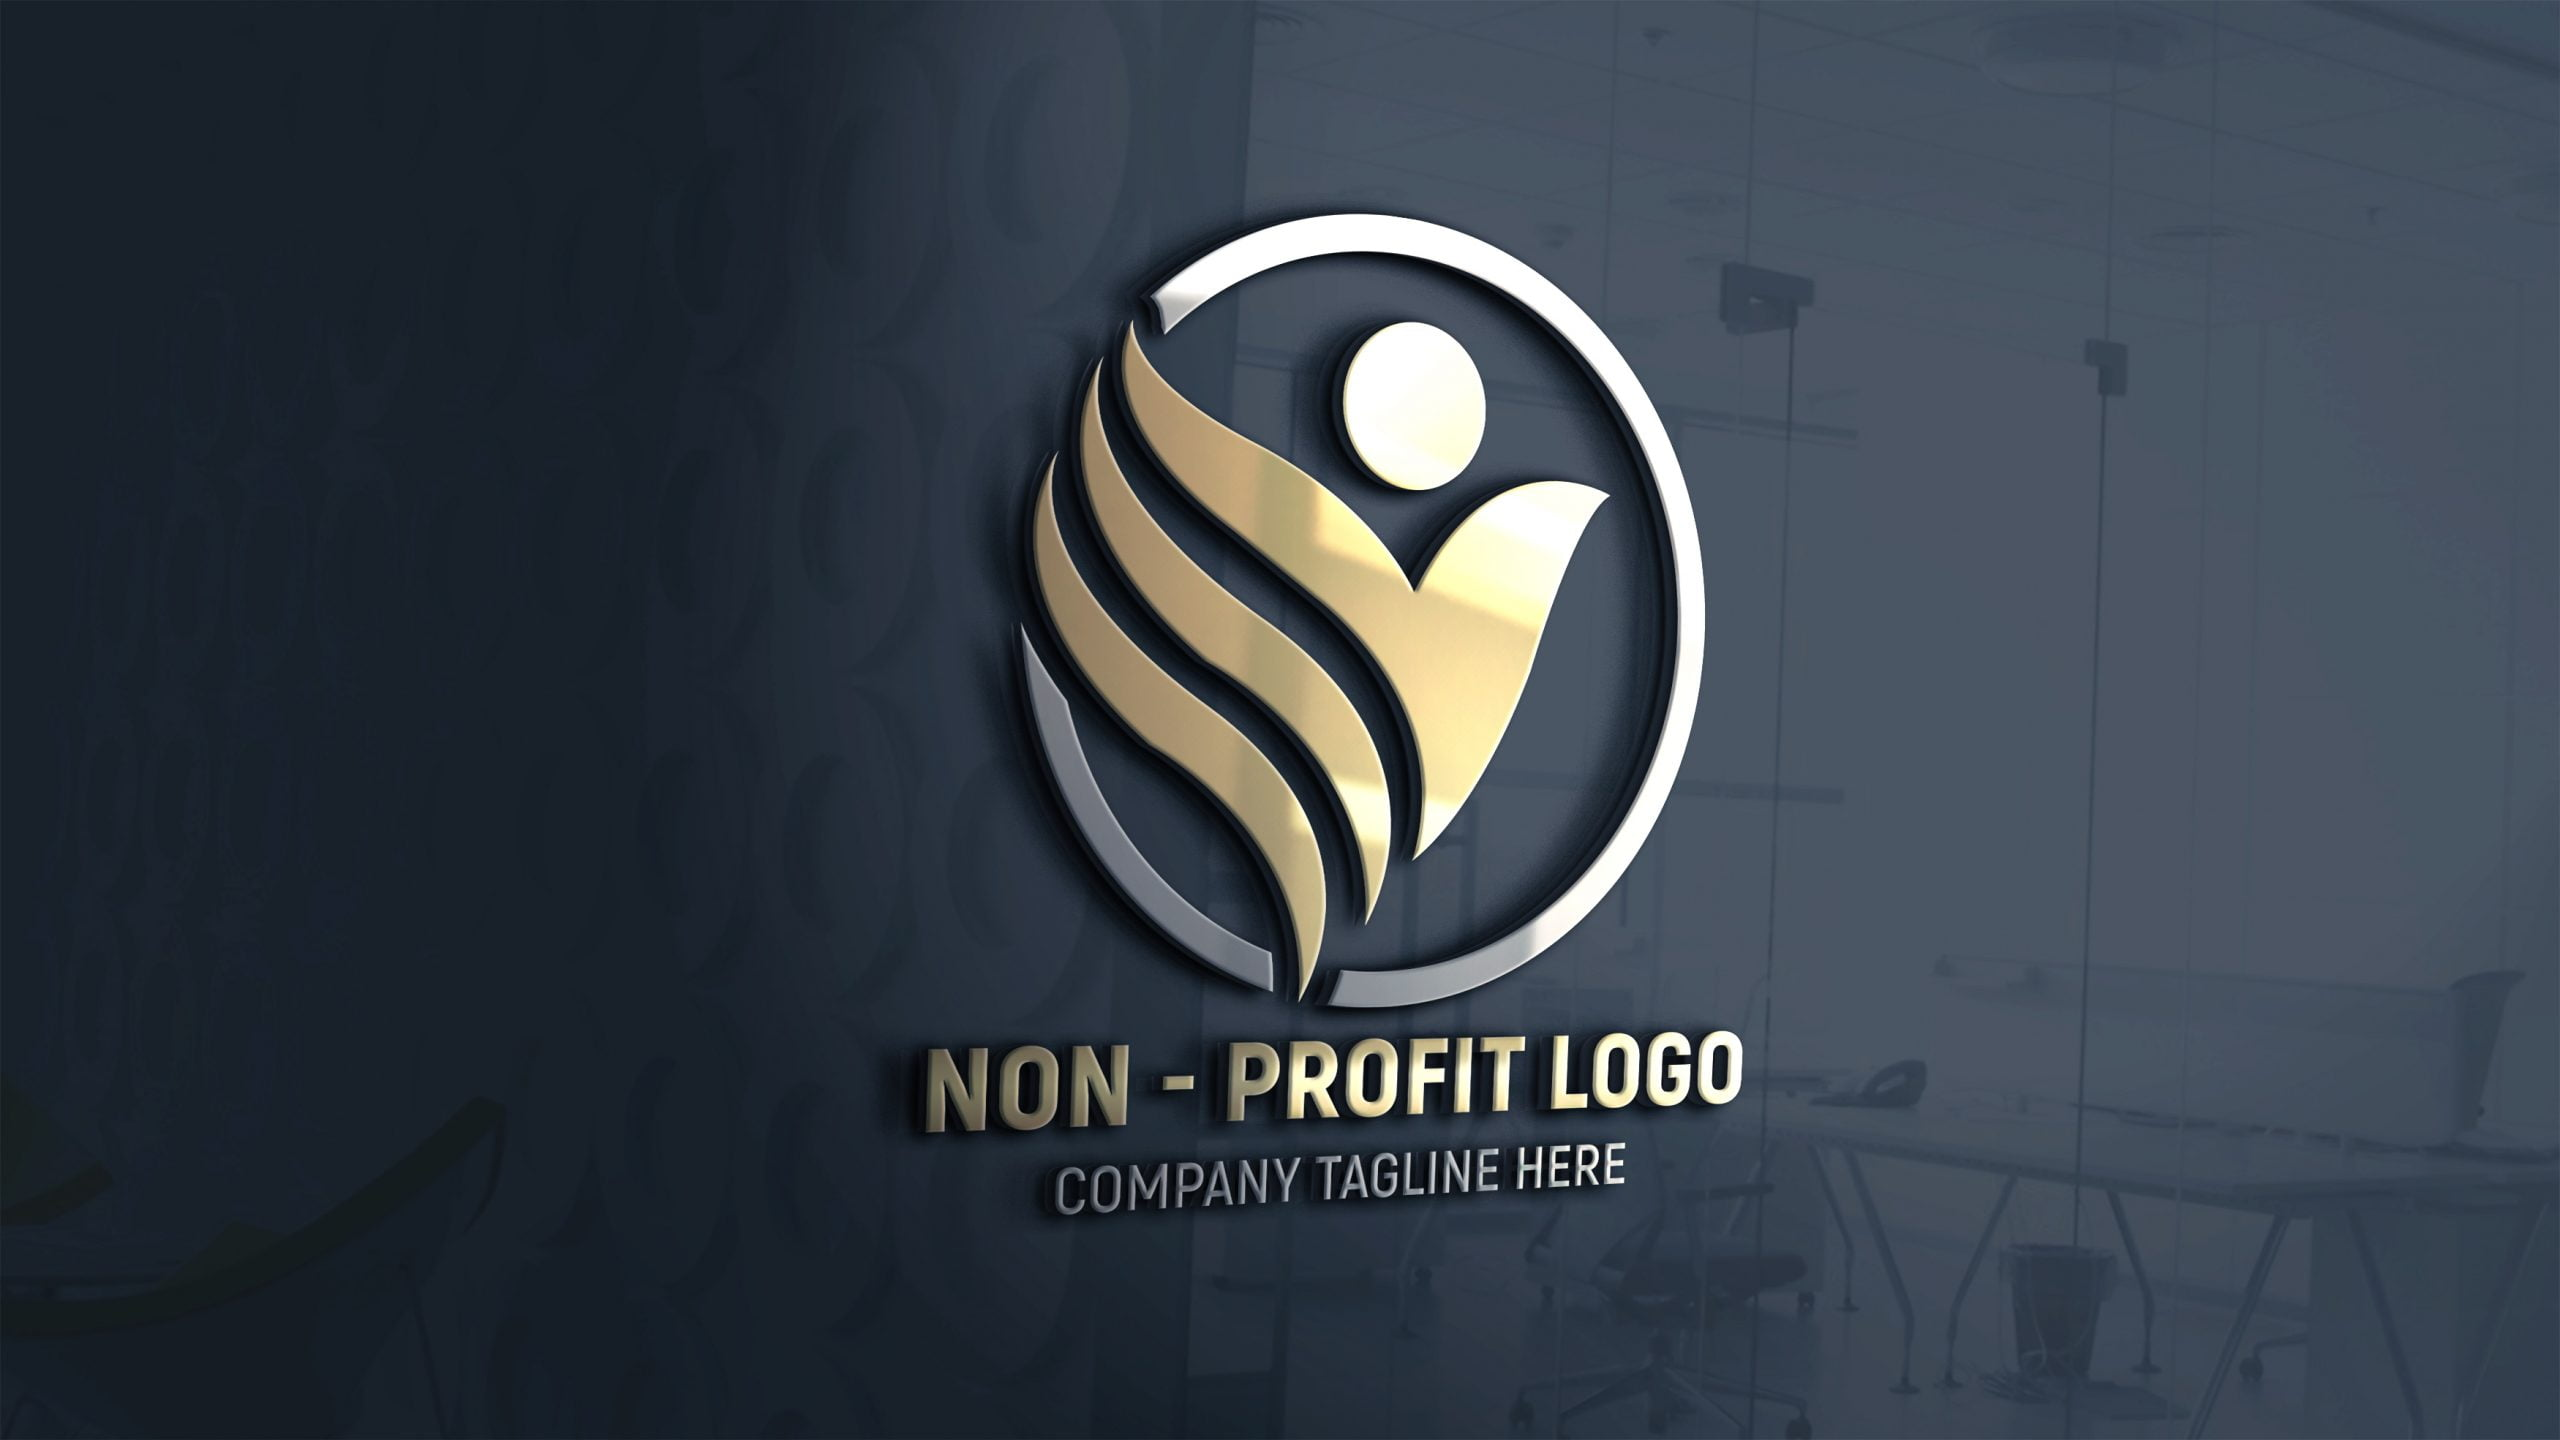 Non-Profit Company Logo Design on 3d glass window